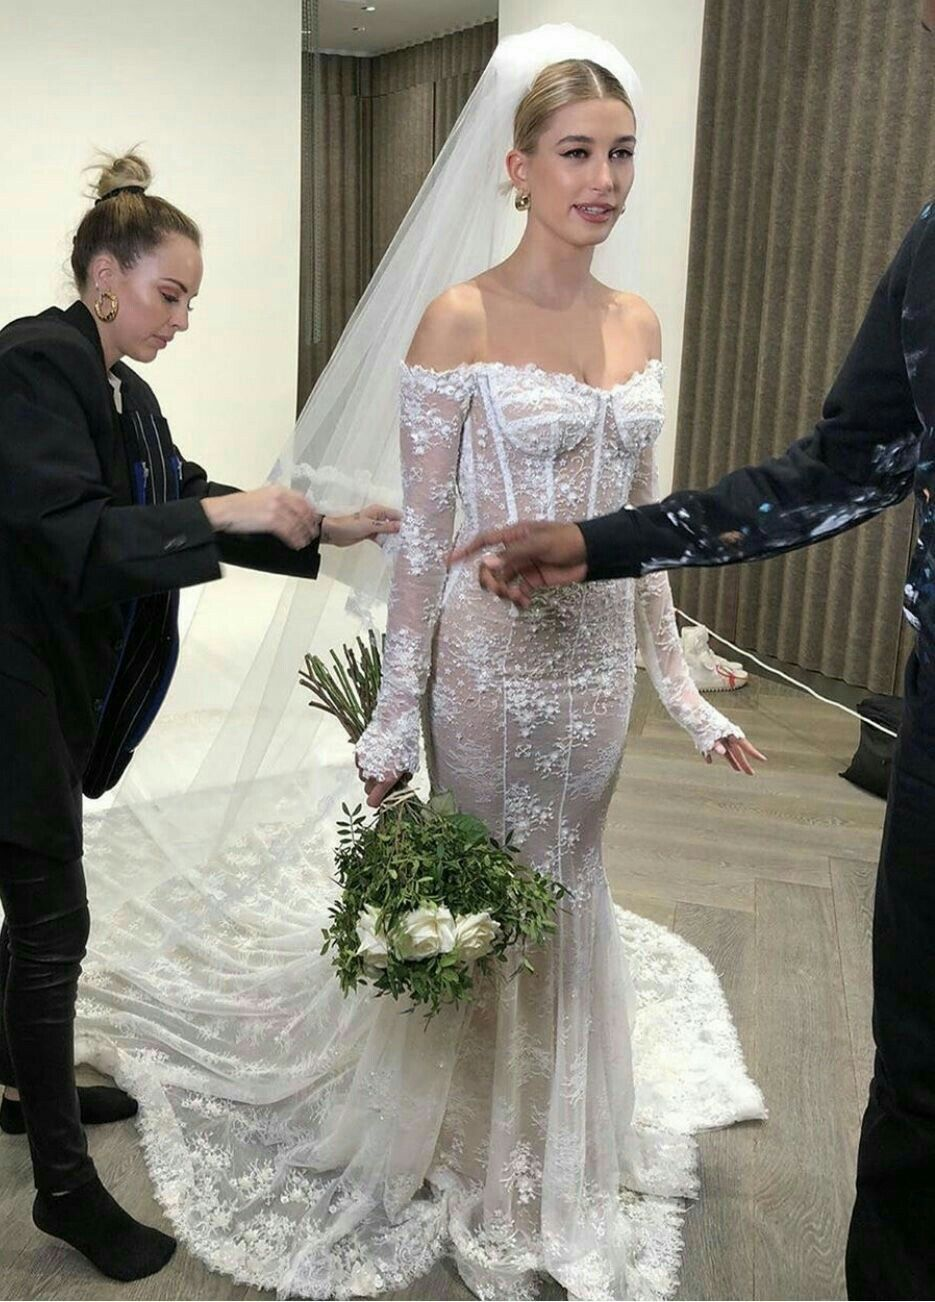 Hailey Bieber In 2021 Celebrity Wedding Dresses Wedding Dresses Ball Gowns Wedding [ 1302 x 935 Pixel ]